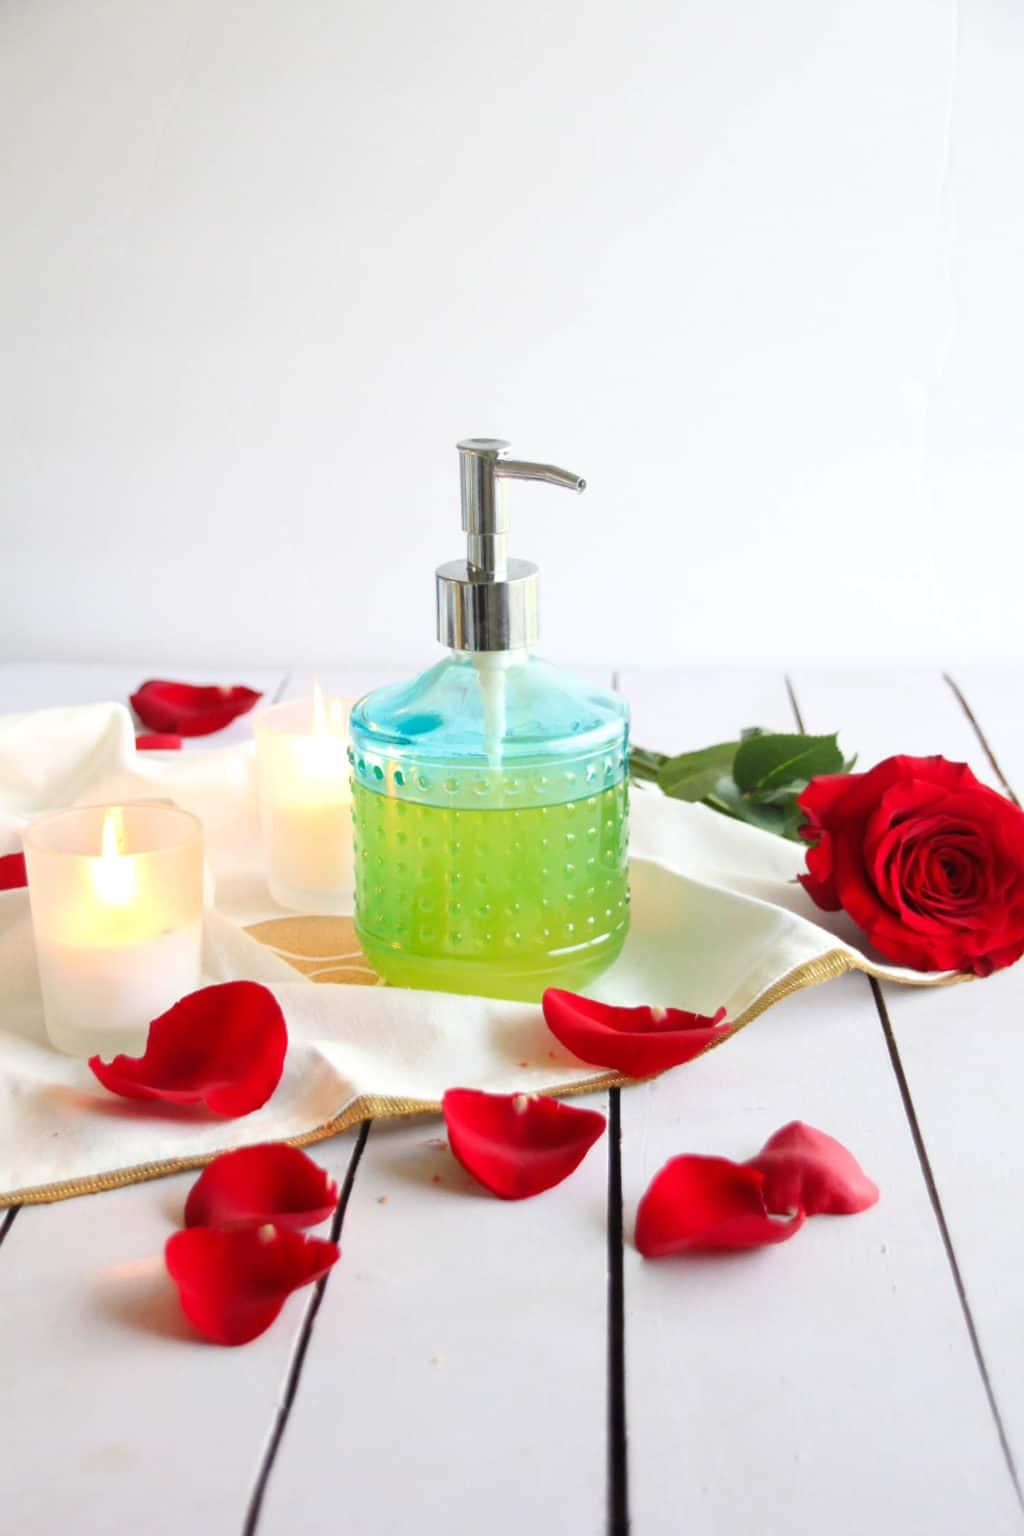 A Sensual Massage how to make a sensual massage oil (regular or warming